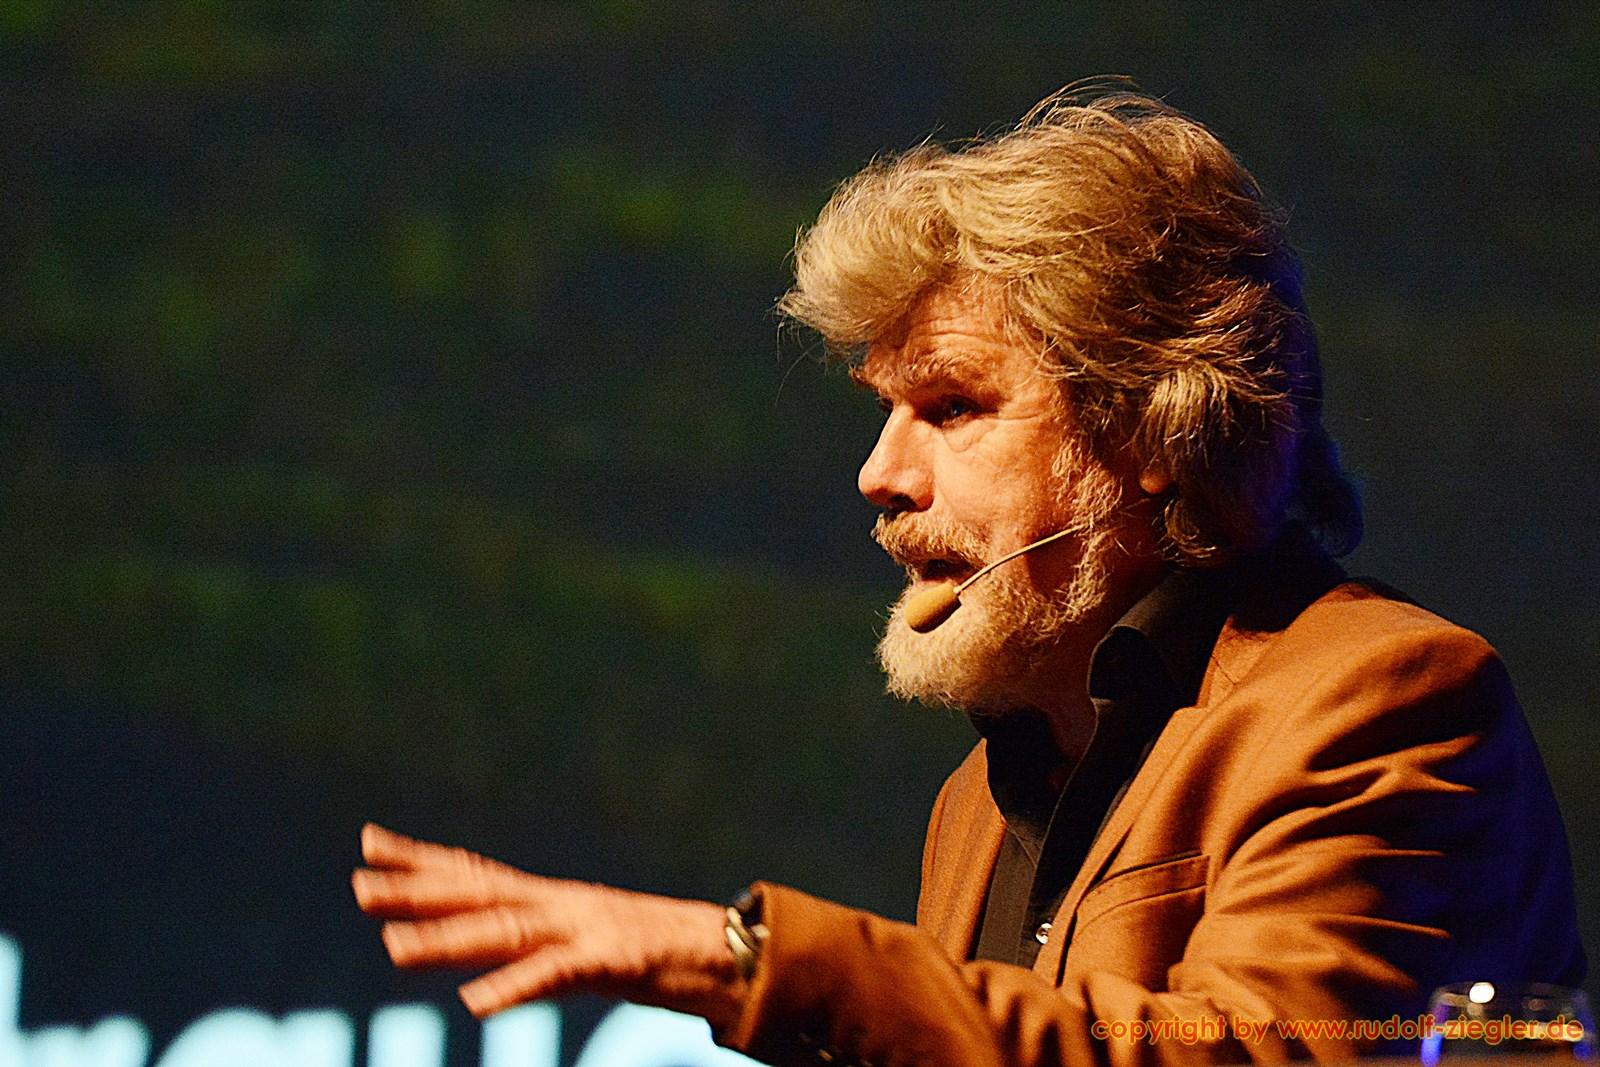 Reinhold Messner - überLeben 041-A-S-A-1600x1200